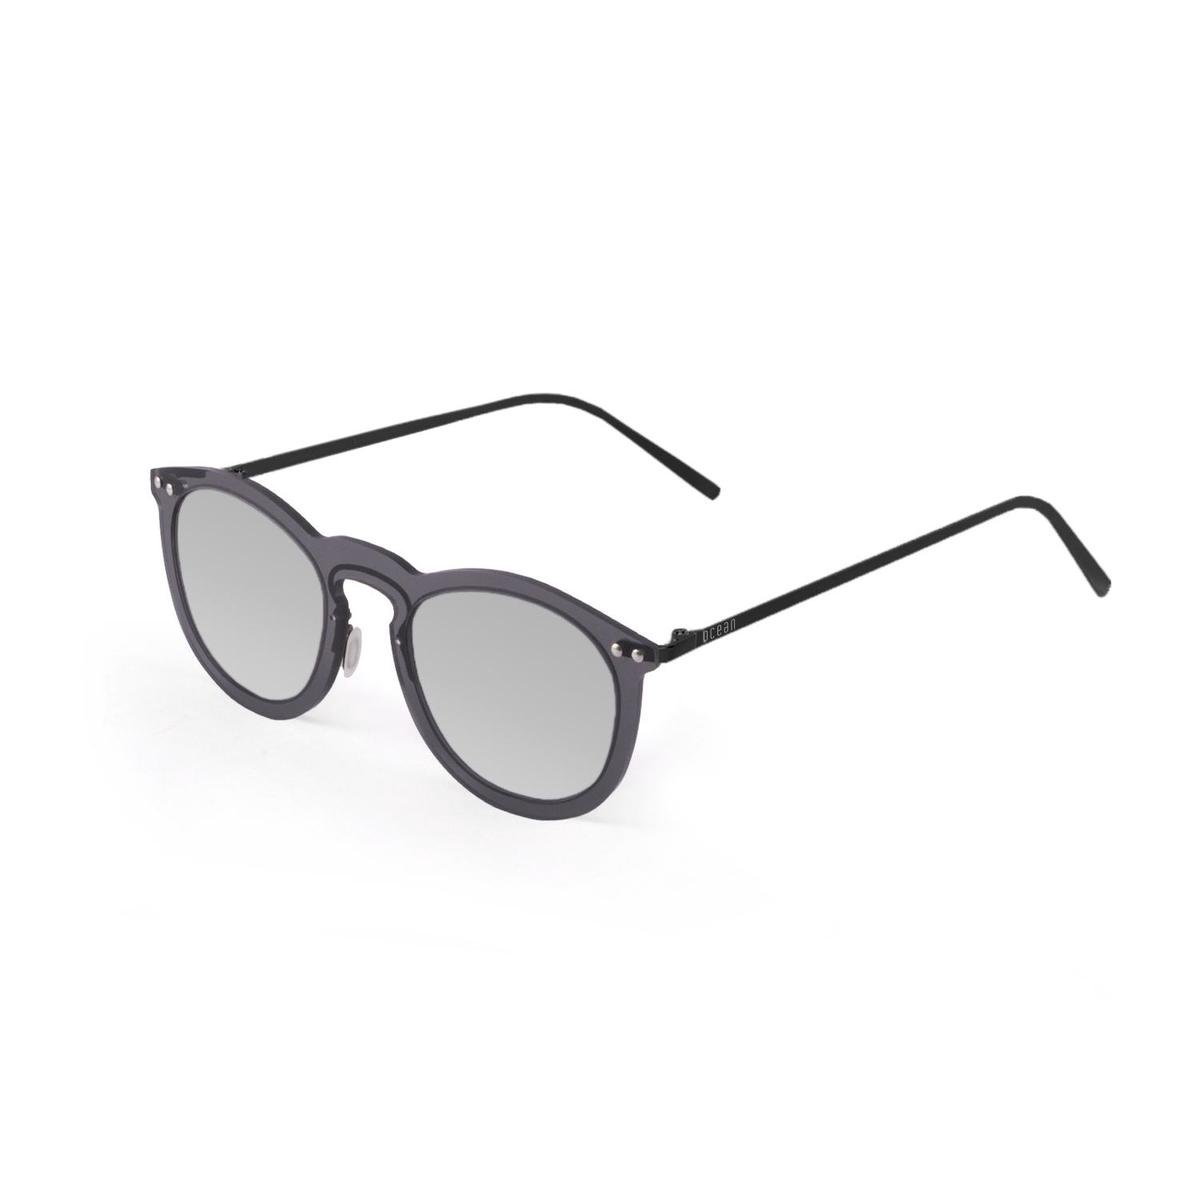 Ocean Sunglasses - HELSINKI - Unisex Zonnebril Grijs - Ocean Sunglasses